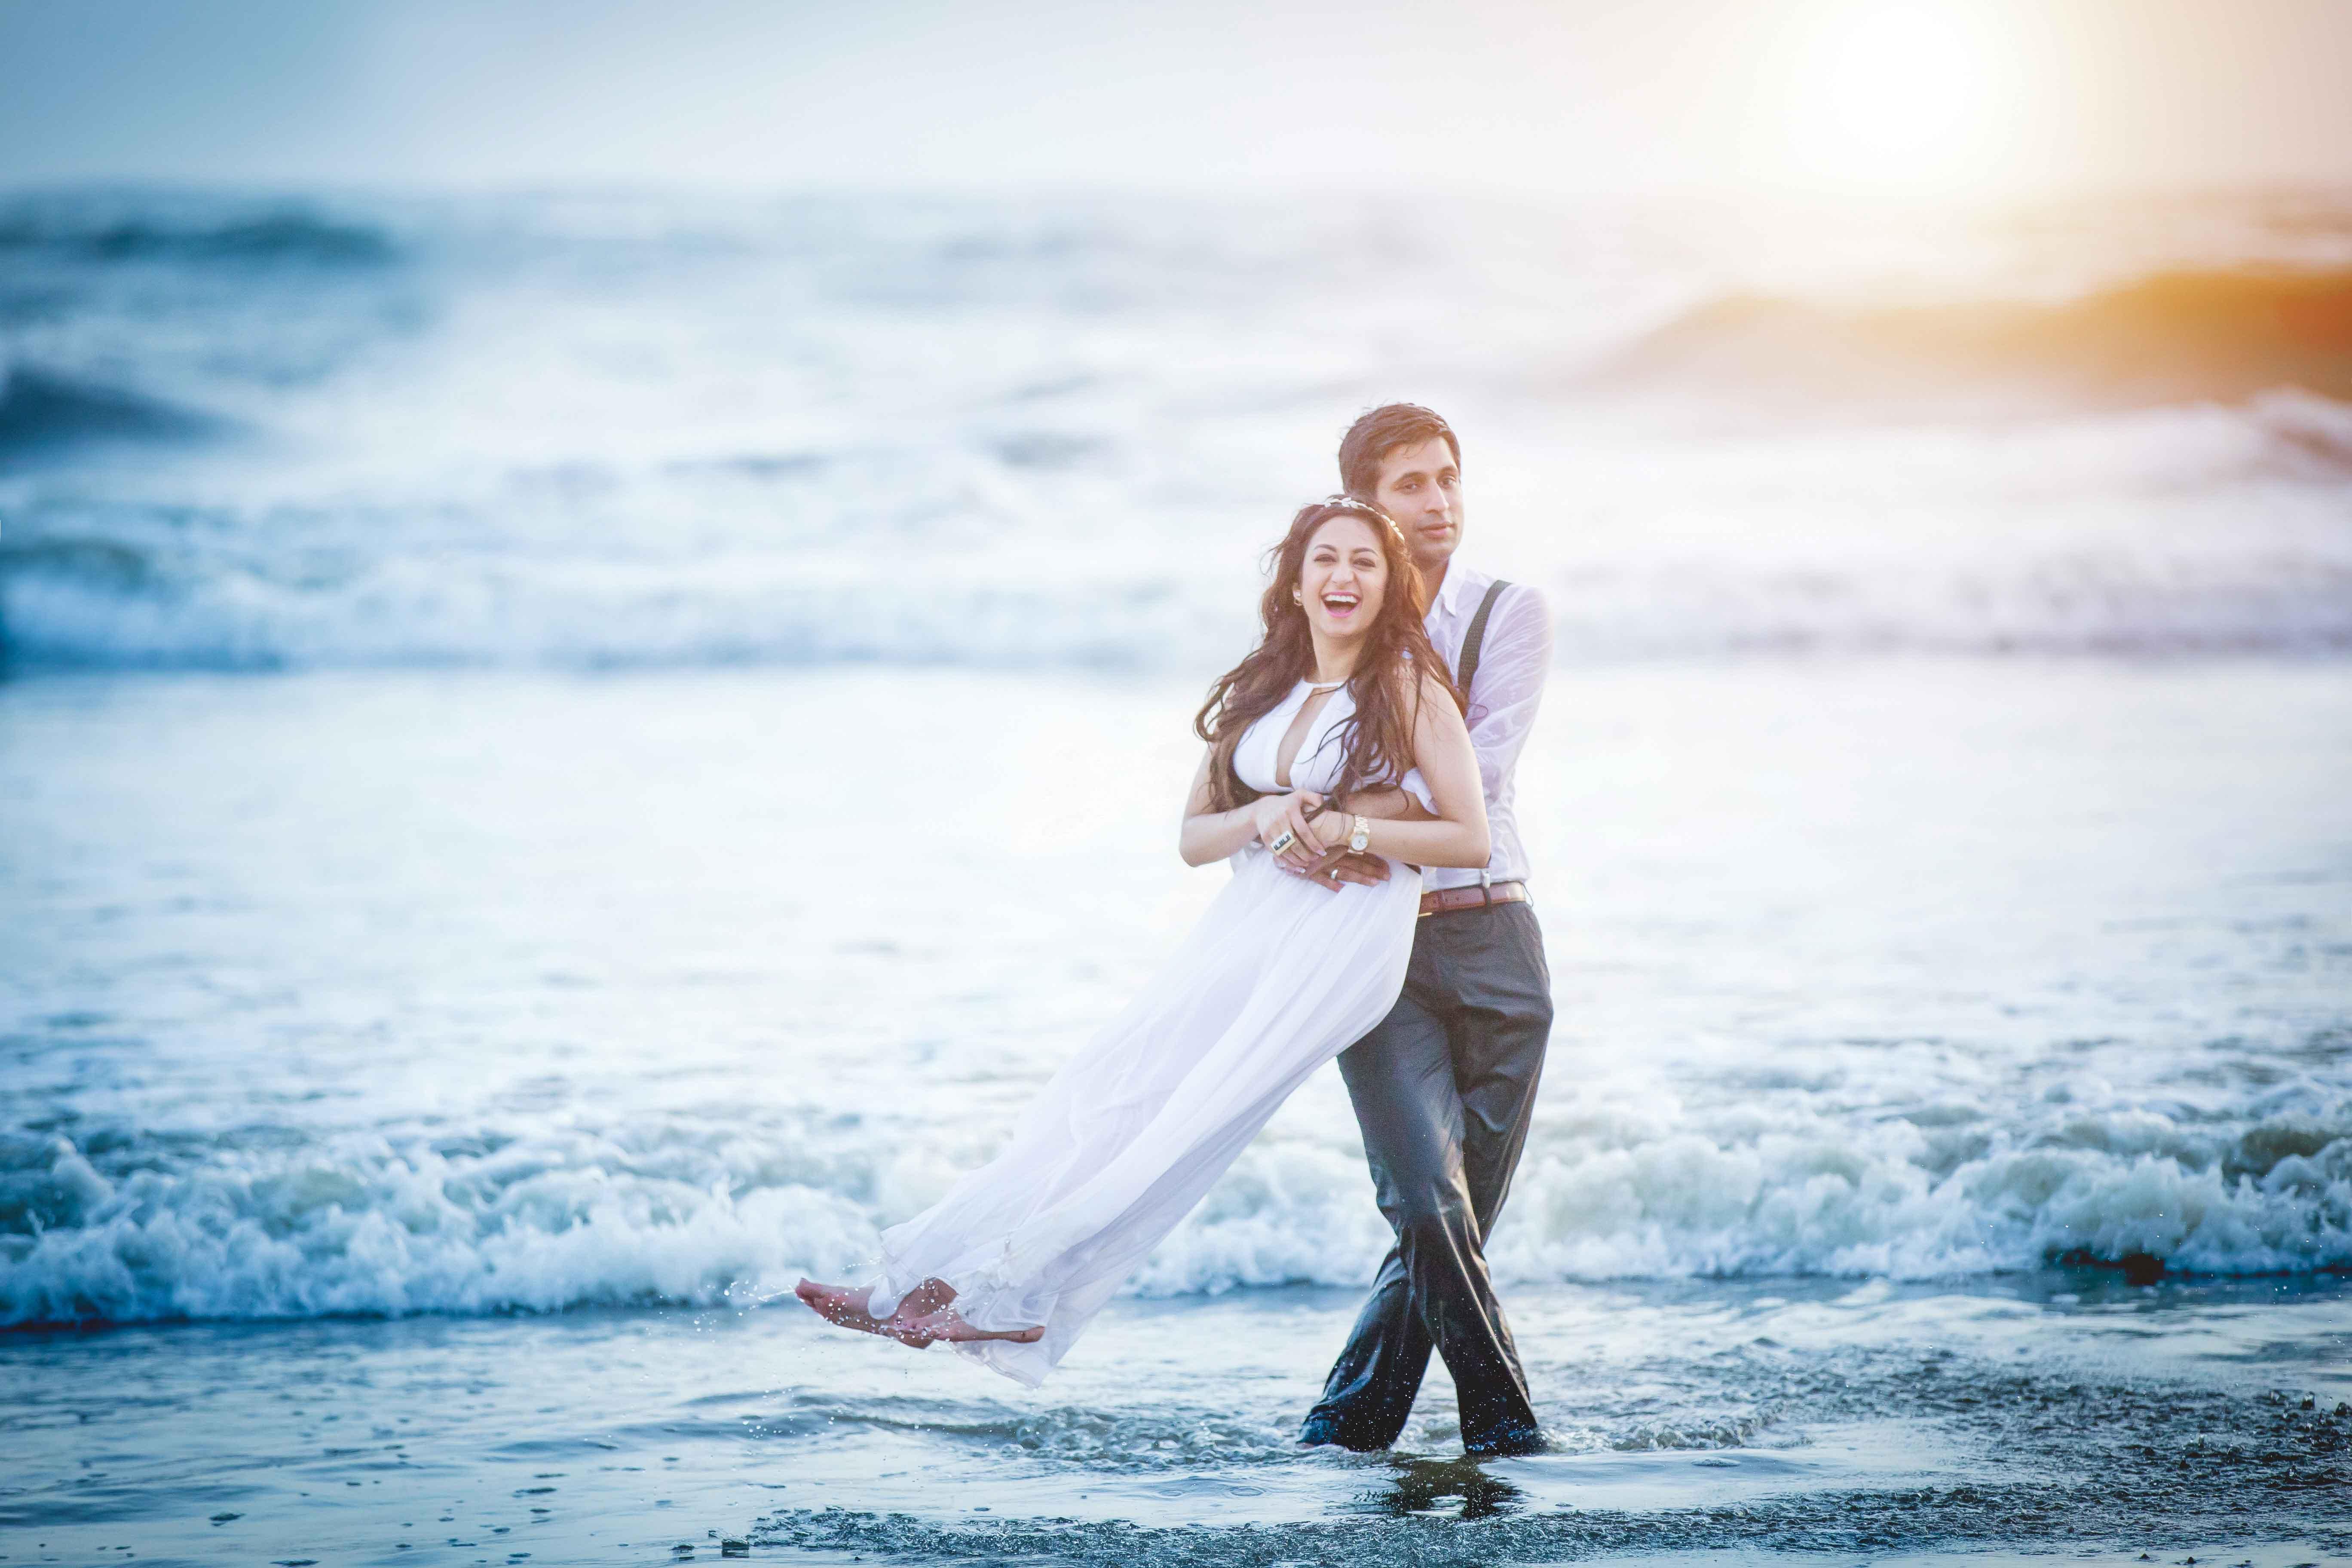 Wedding Photography, Wedding Photographer, Jodi Clickers, Jodi Clickers WEdding PHotography, Pre WEdding Shoot, Pre Wedding PHotography, PRe WEdding Shoot IDeas, Romantic Shoot